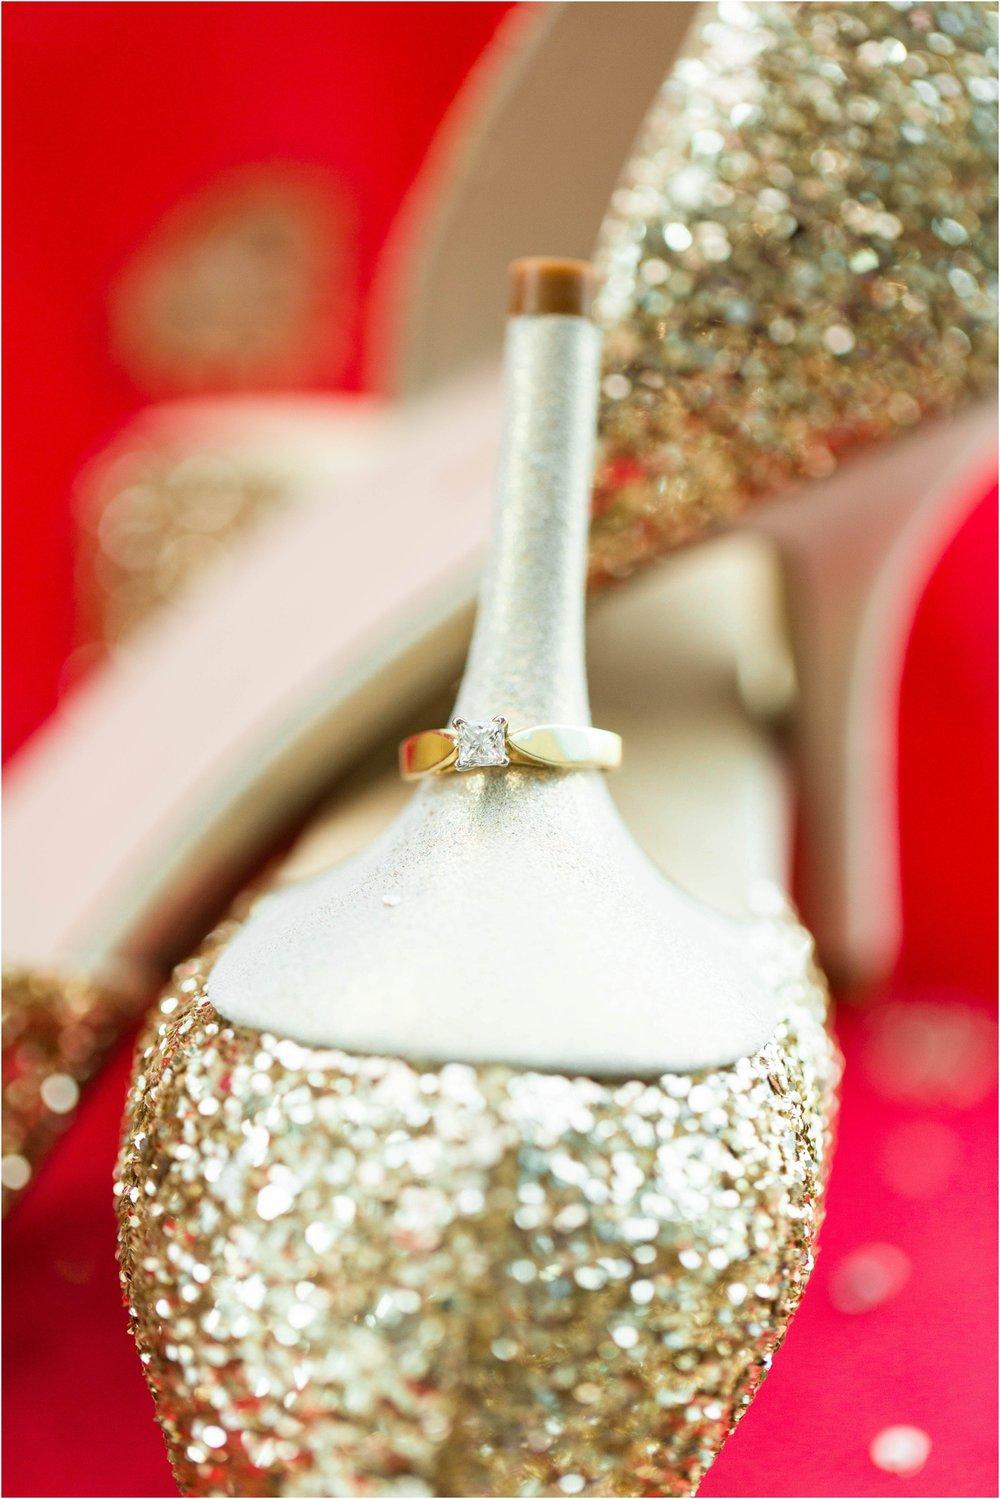 Best-of-2017-Weddings-Toronto-Mississauga-Brampton-Scarborough-GTA-Pakistani-Indian-Wedding-Engagement-Photographer-Photography_0047.jpg